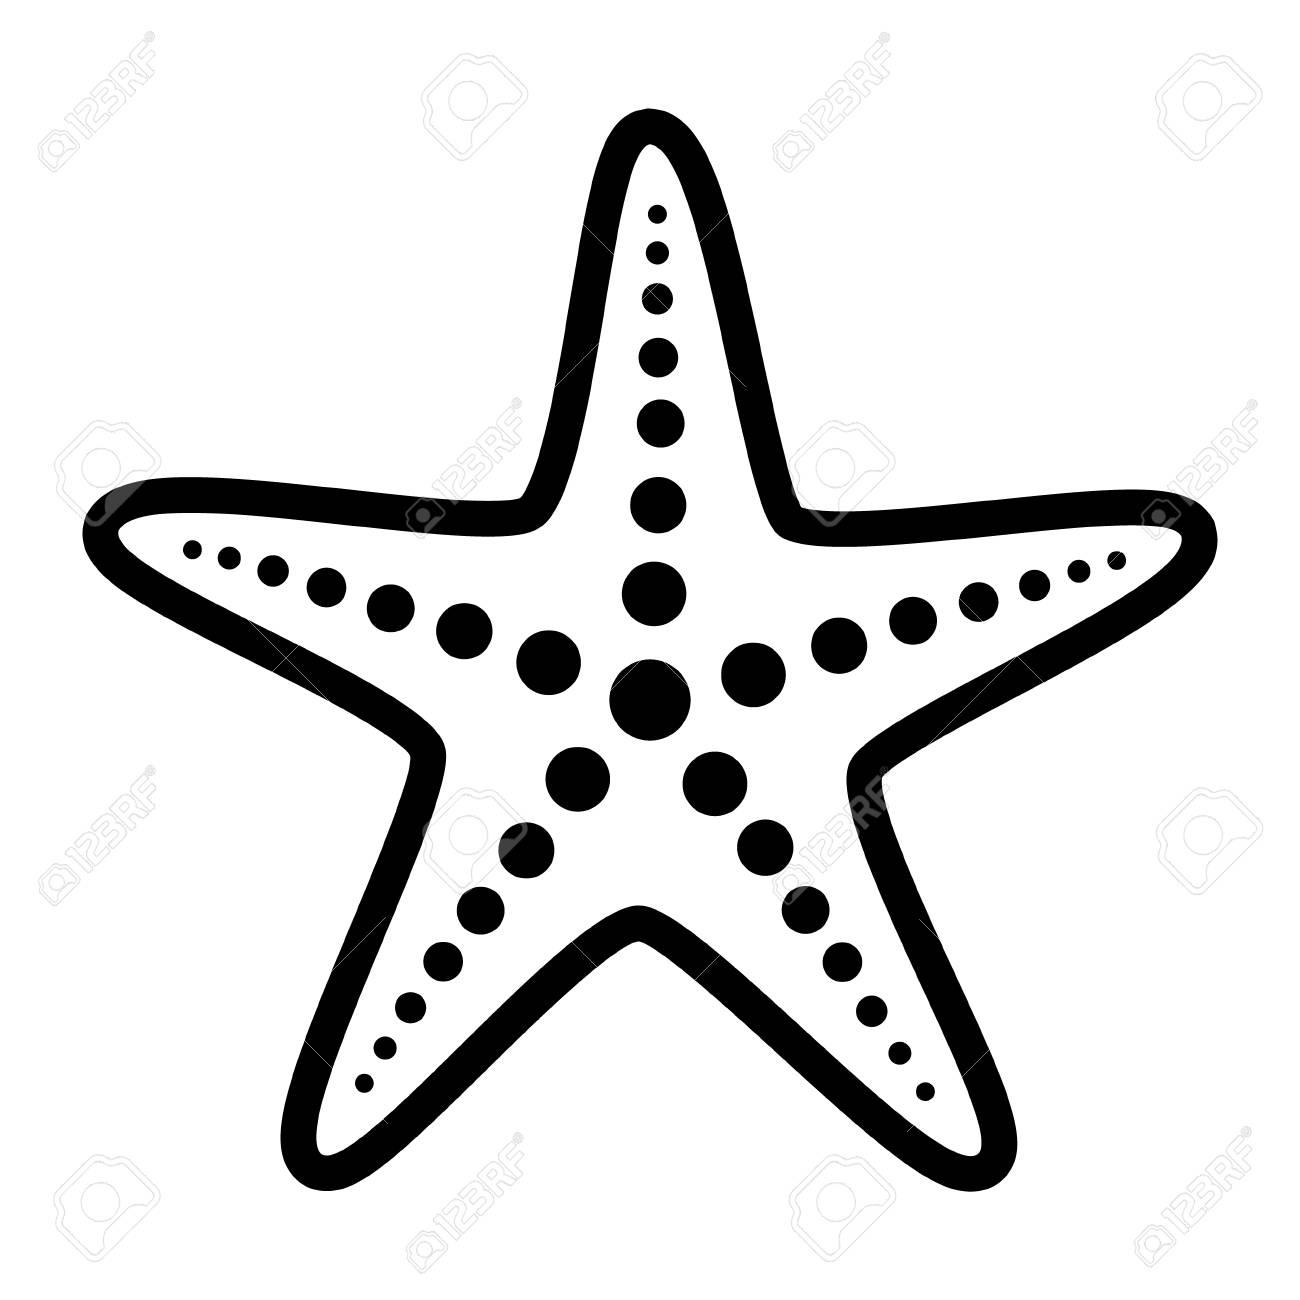 Black White Sea Star Outline Wiring Diagrams Figure 4mcs Rigid Hull Inflatable Boat Diagram Sheet 1 Common Starfish Or Fish Marine Life Line Art Vector Rh 123rf Com Blue Clip